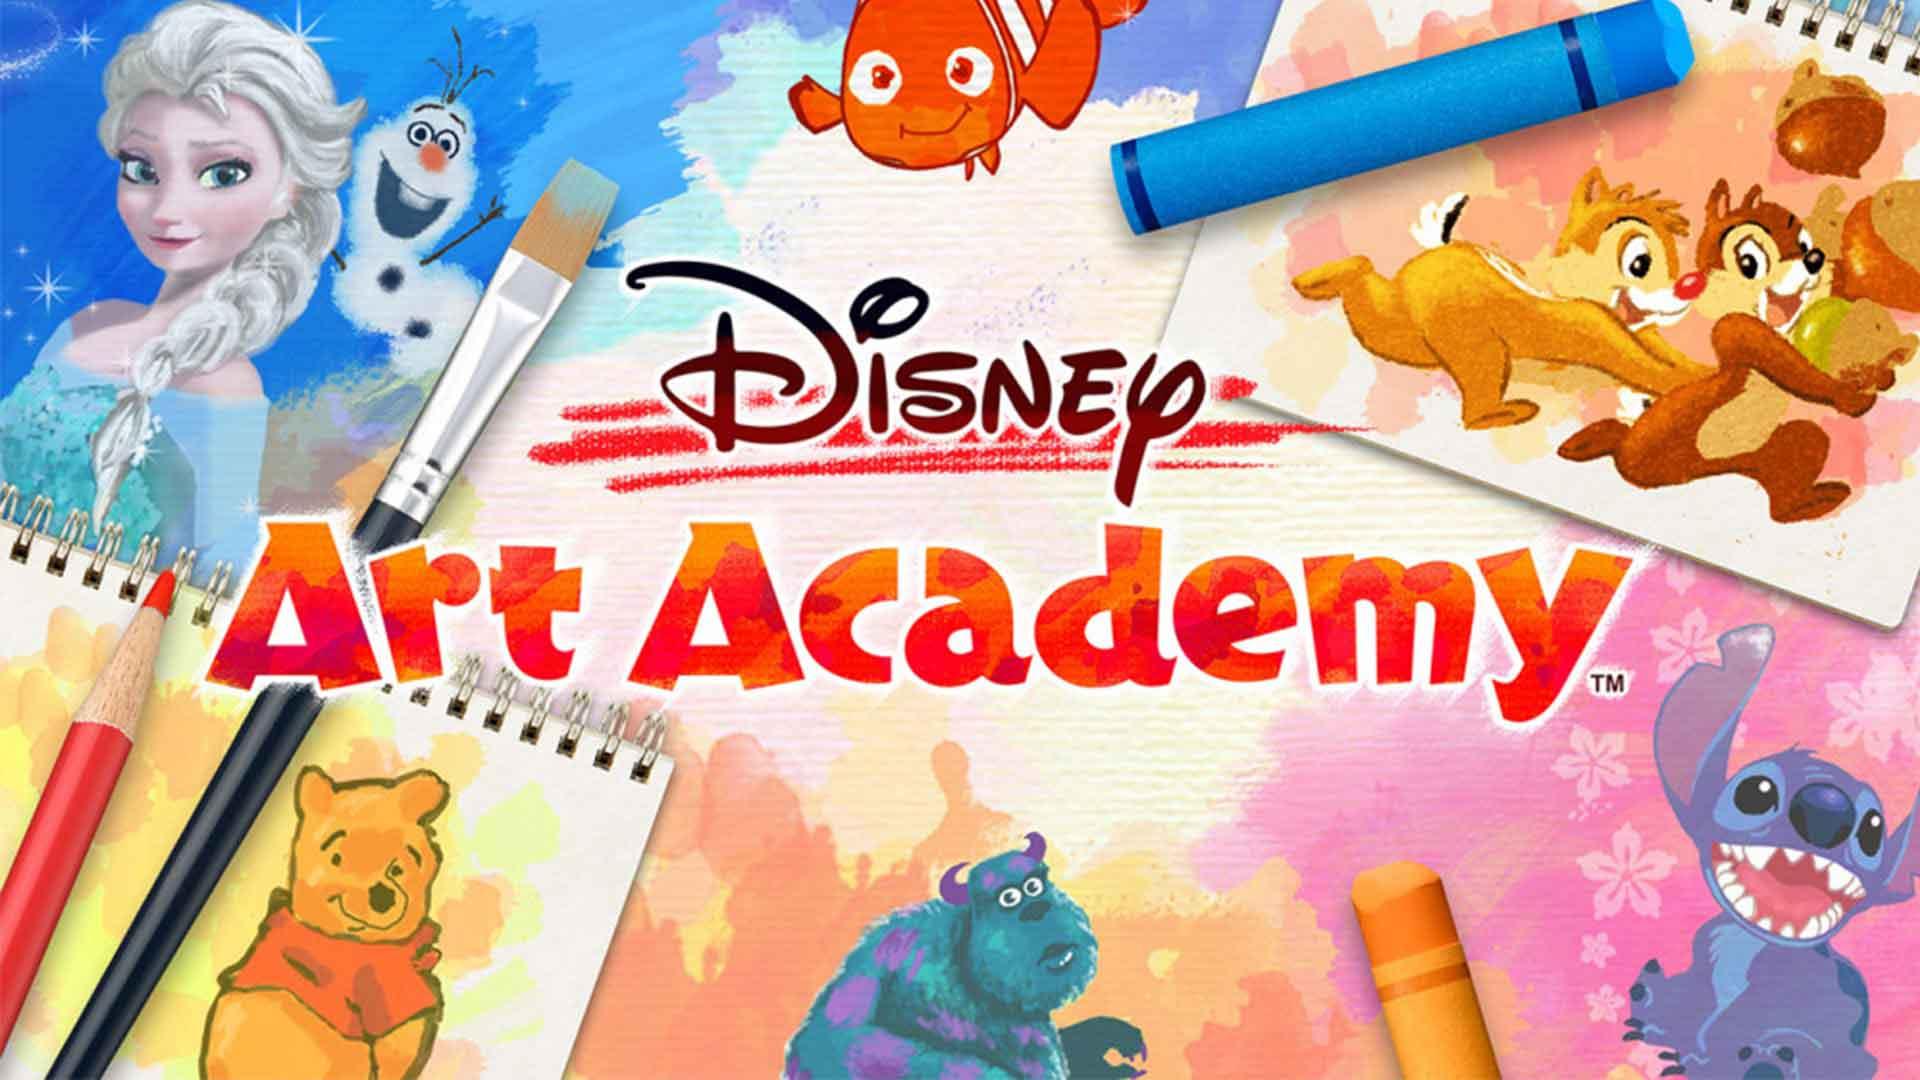 Disney-Art-Academy_1.jpg